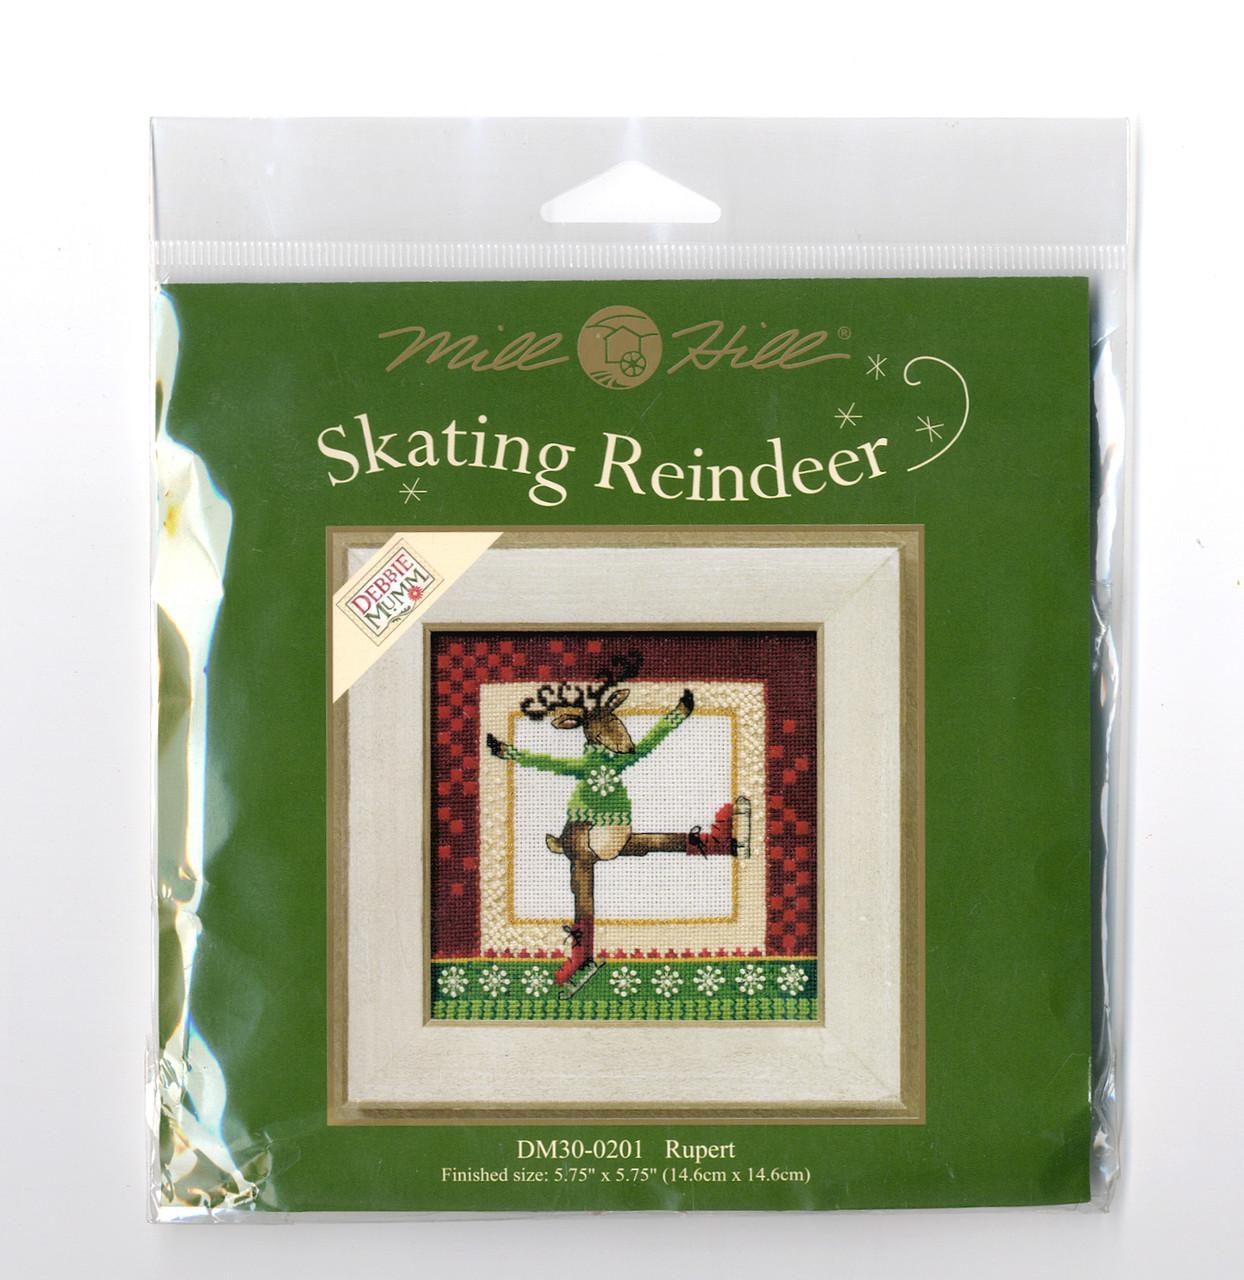 2010 Mill Hill Debbie Mumm Skating Reindeer Series (Set of 4 Kits)